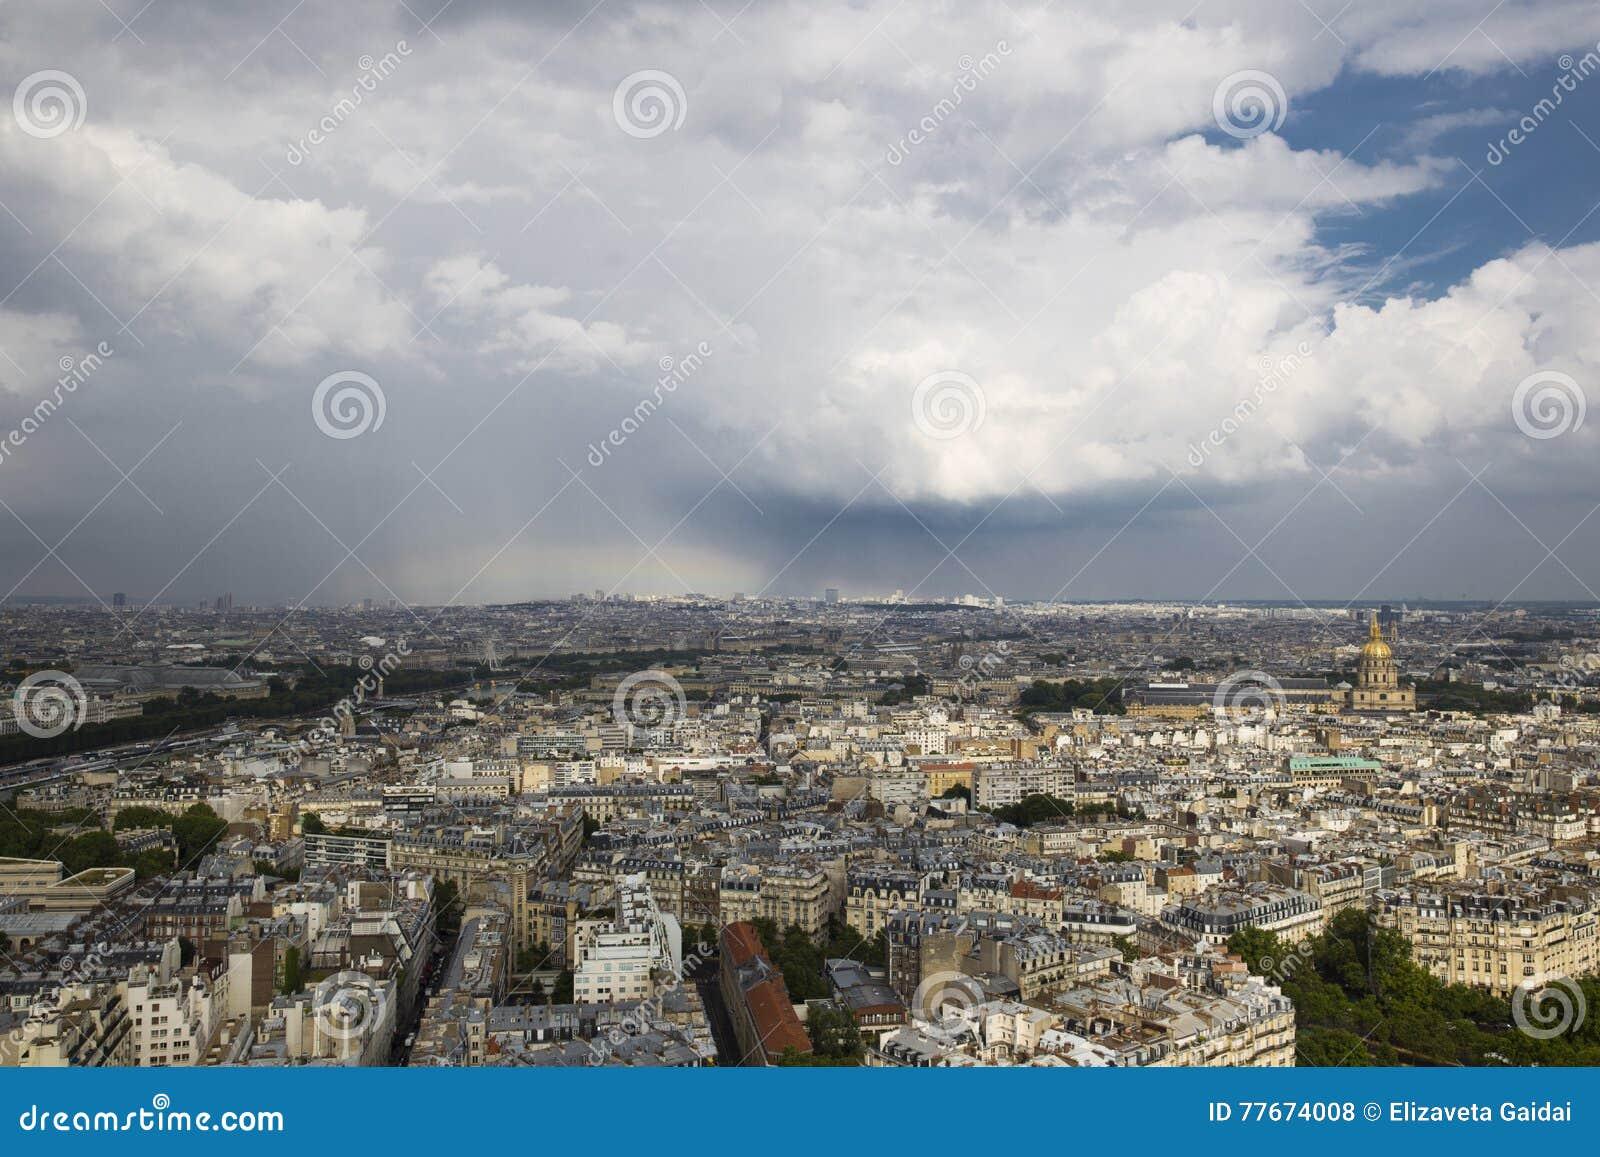 Top view of the beautiful Paris